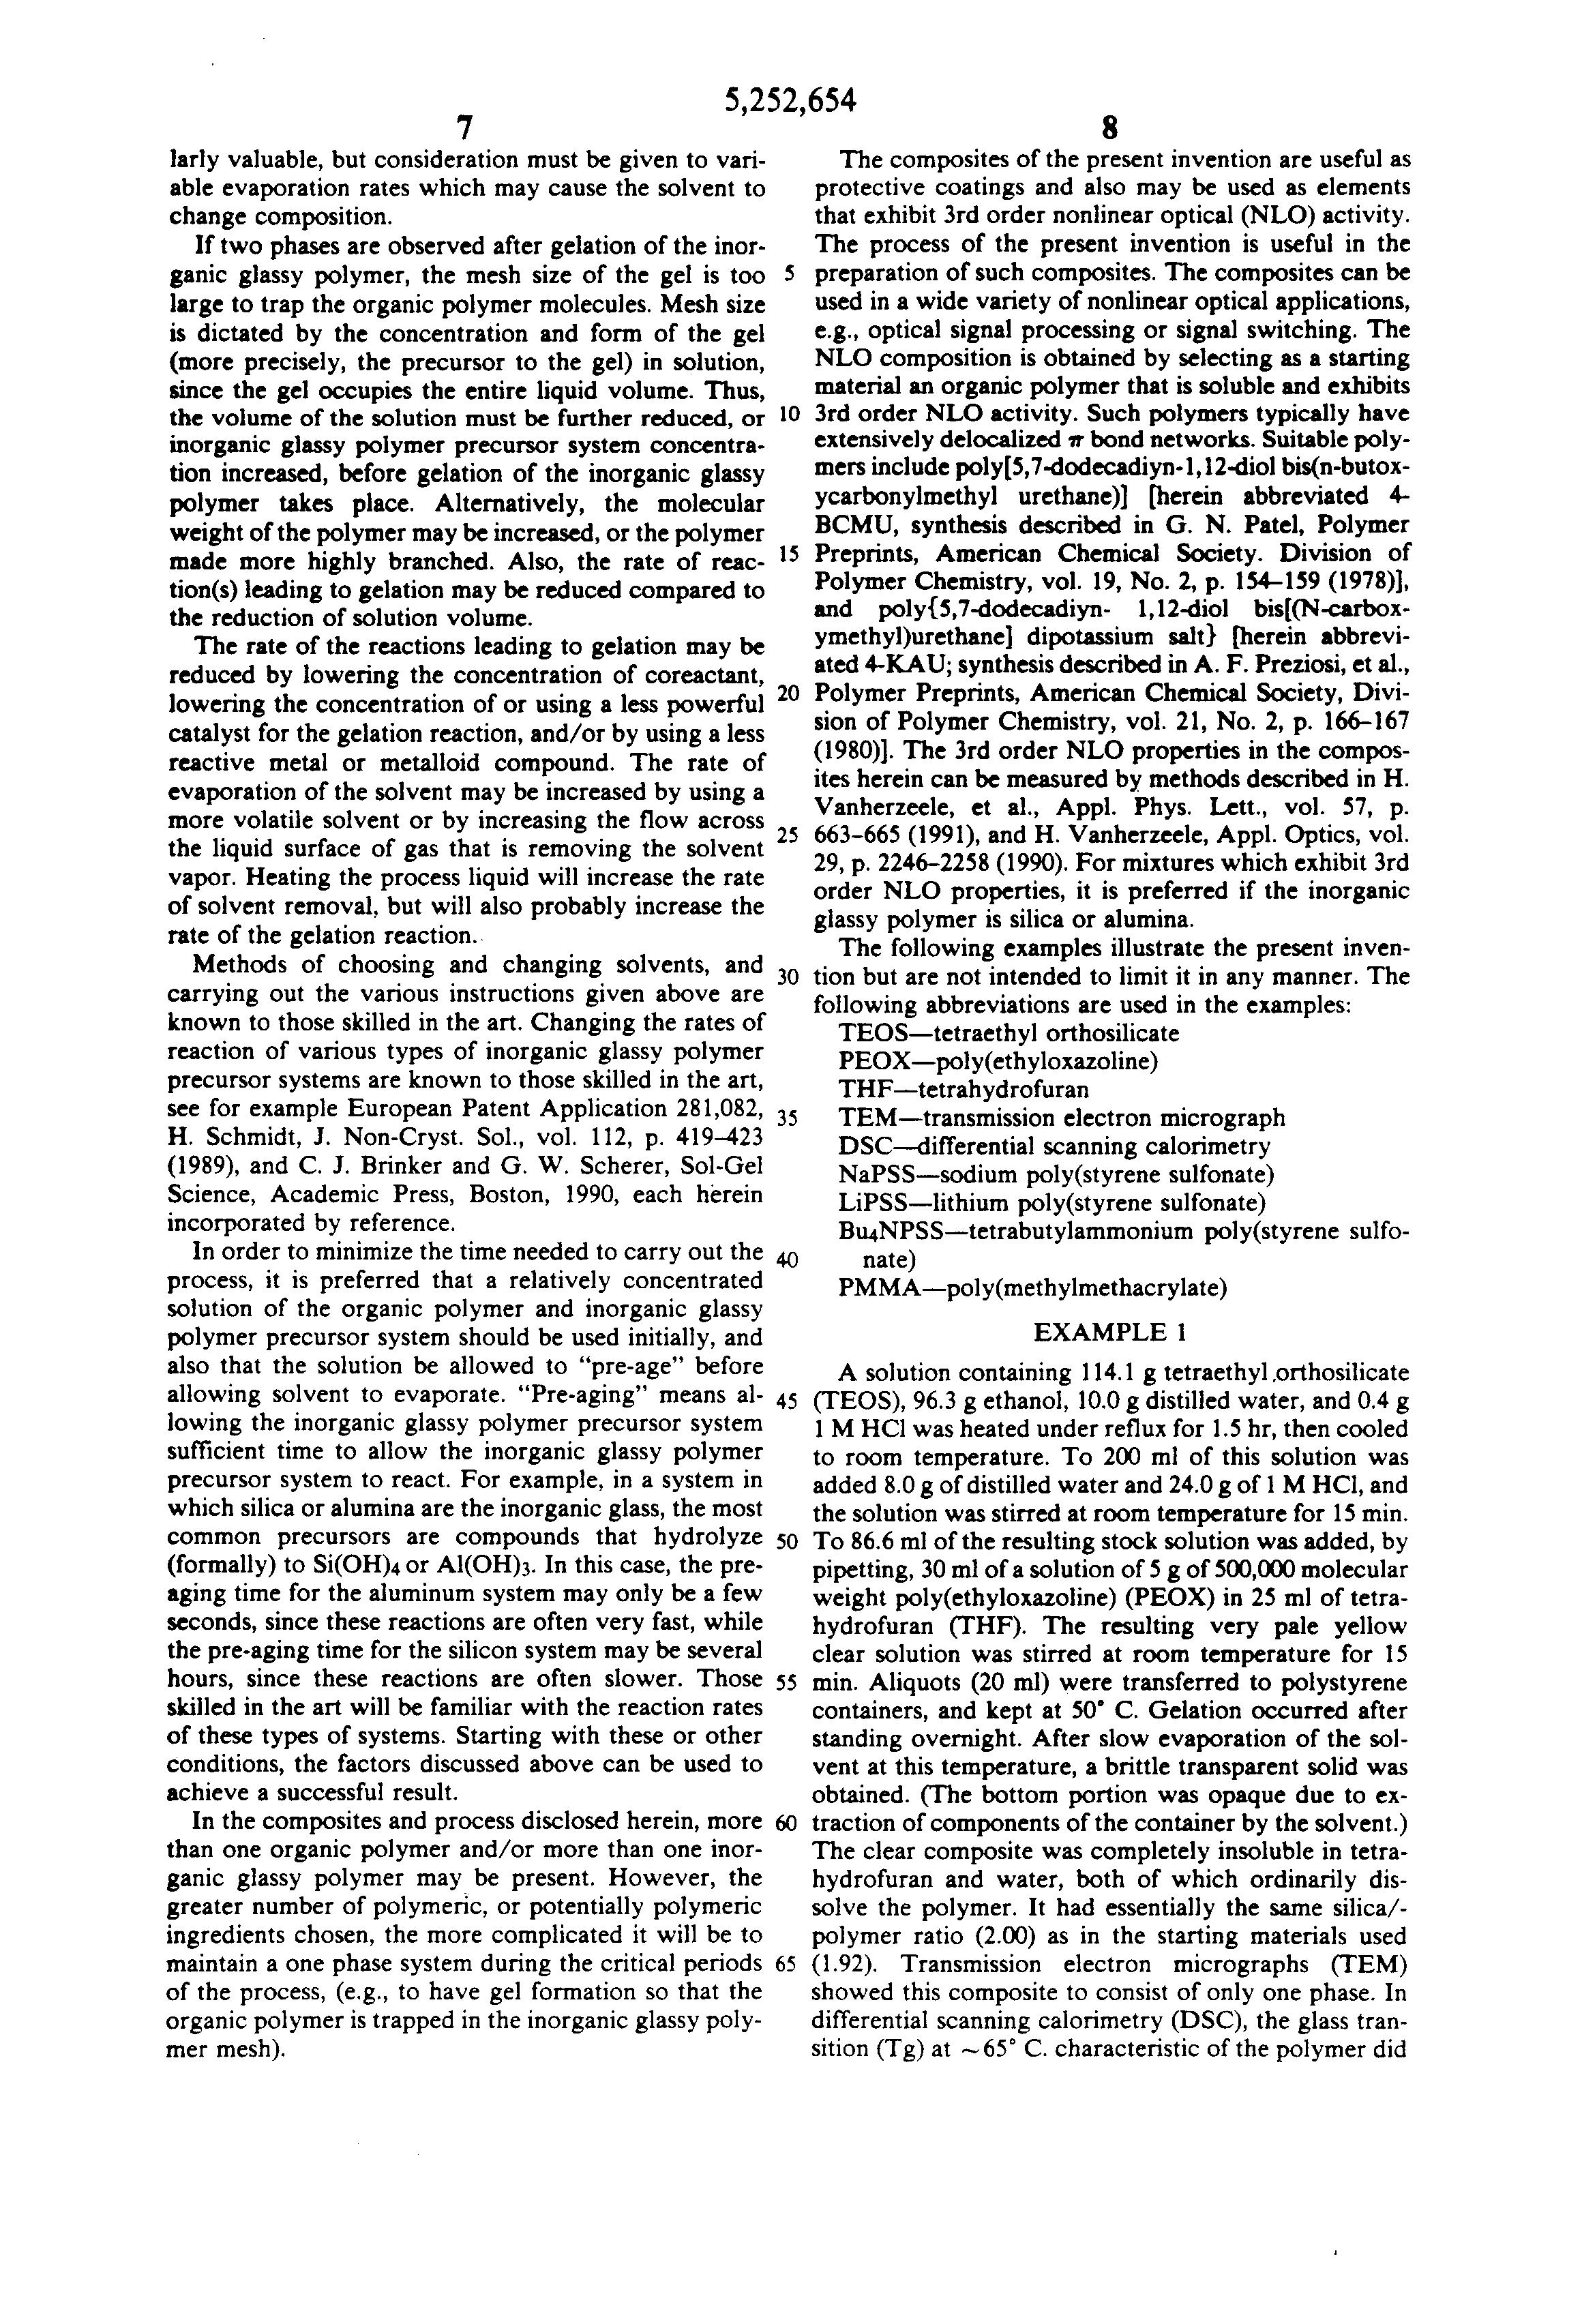 EBOOK TOPICS IN ORGANOMETALLIC CHEM. PALLADIUM IN ORGANIC SYNTHESIS 2005